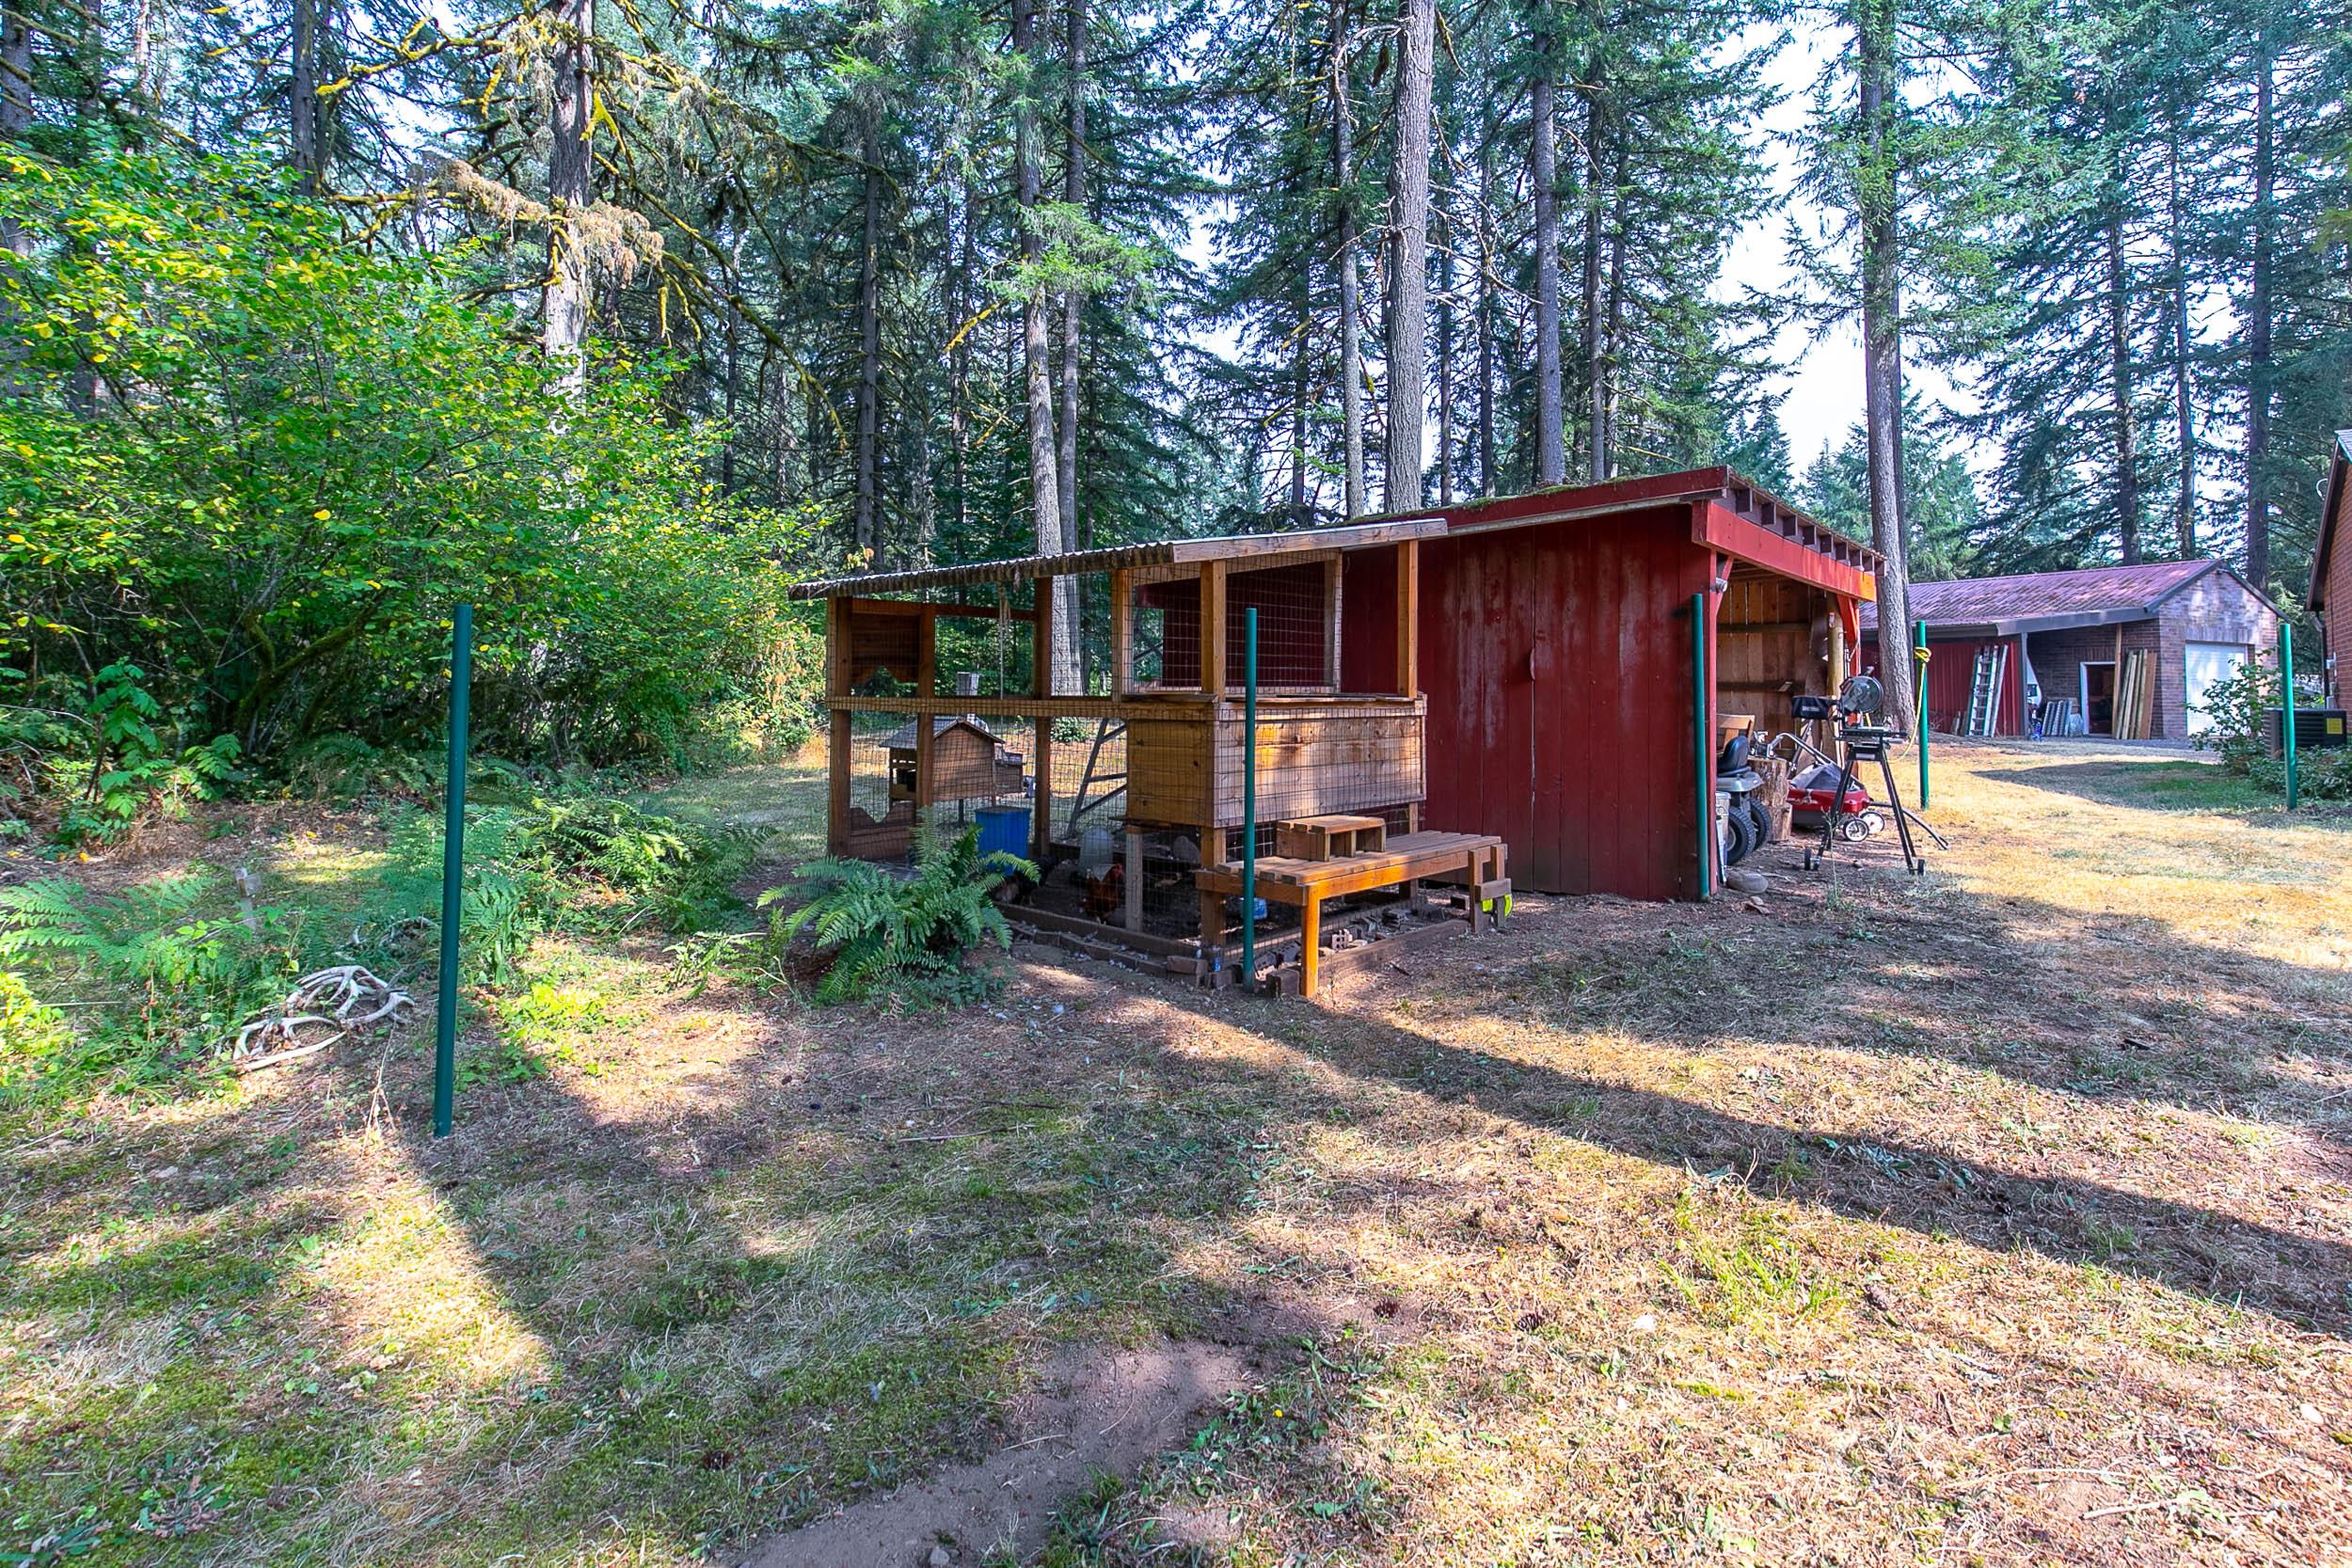 044_16181 S Eaden Rd Oregon City_MG_6875-HDR.jpg